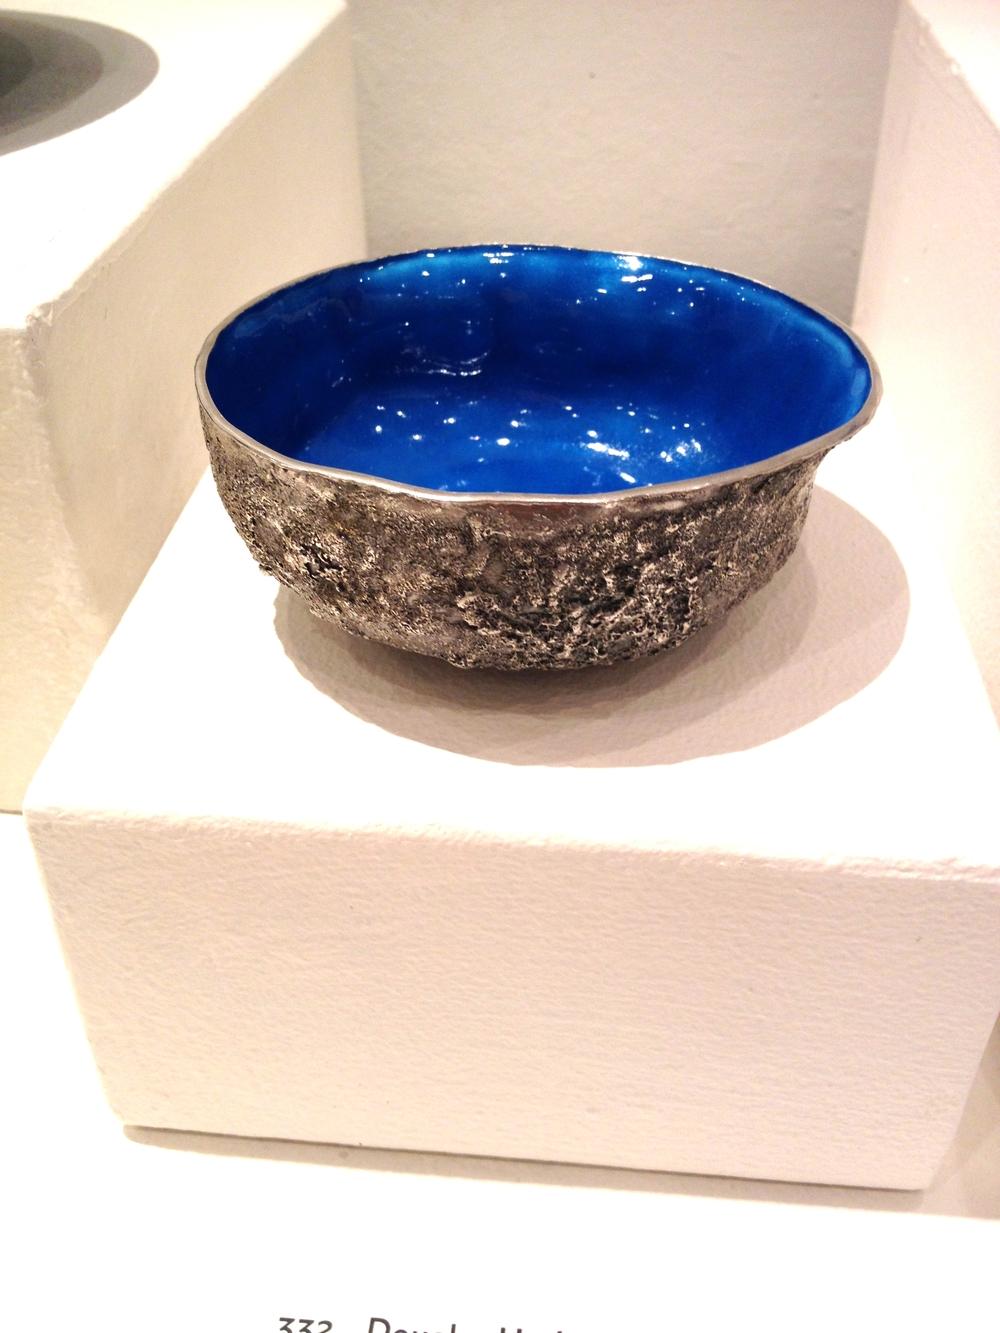 Douglas Harling    Alms Bowl  Silver, enamel 2 x 4H x 4H inches